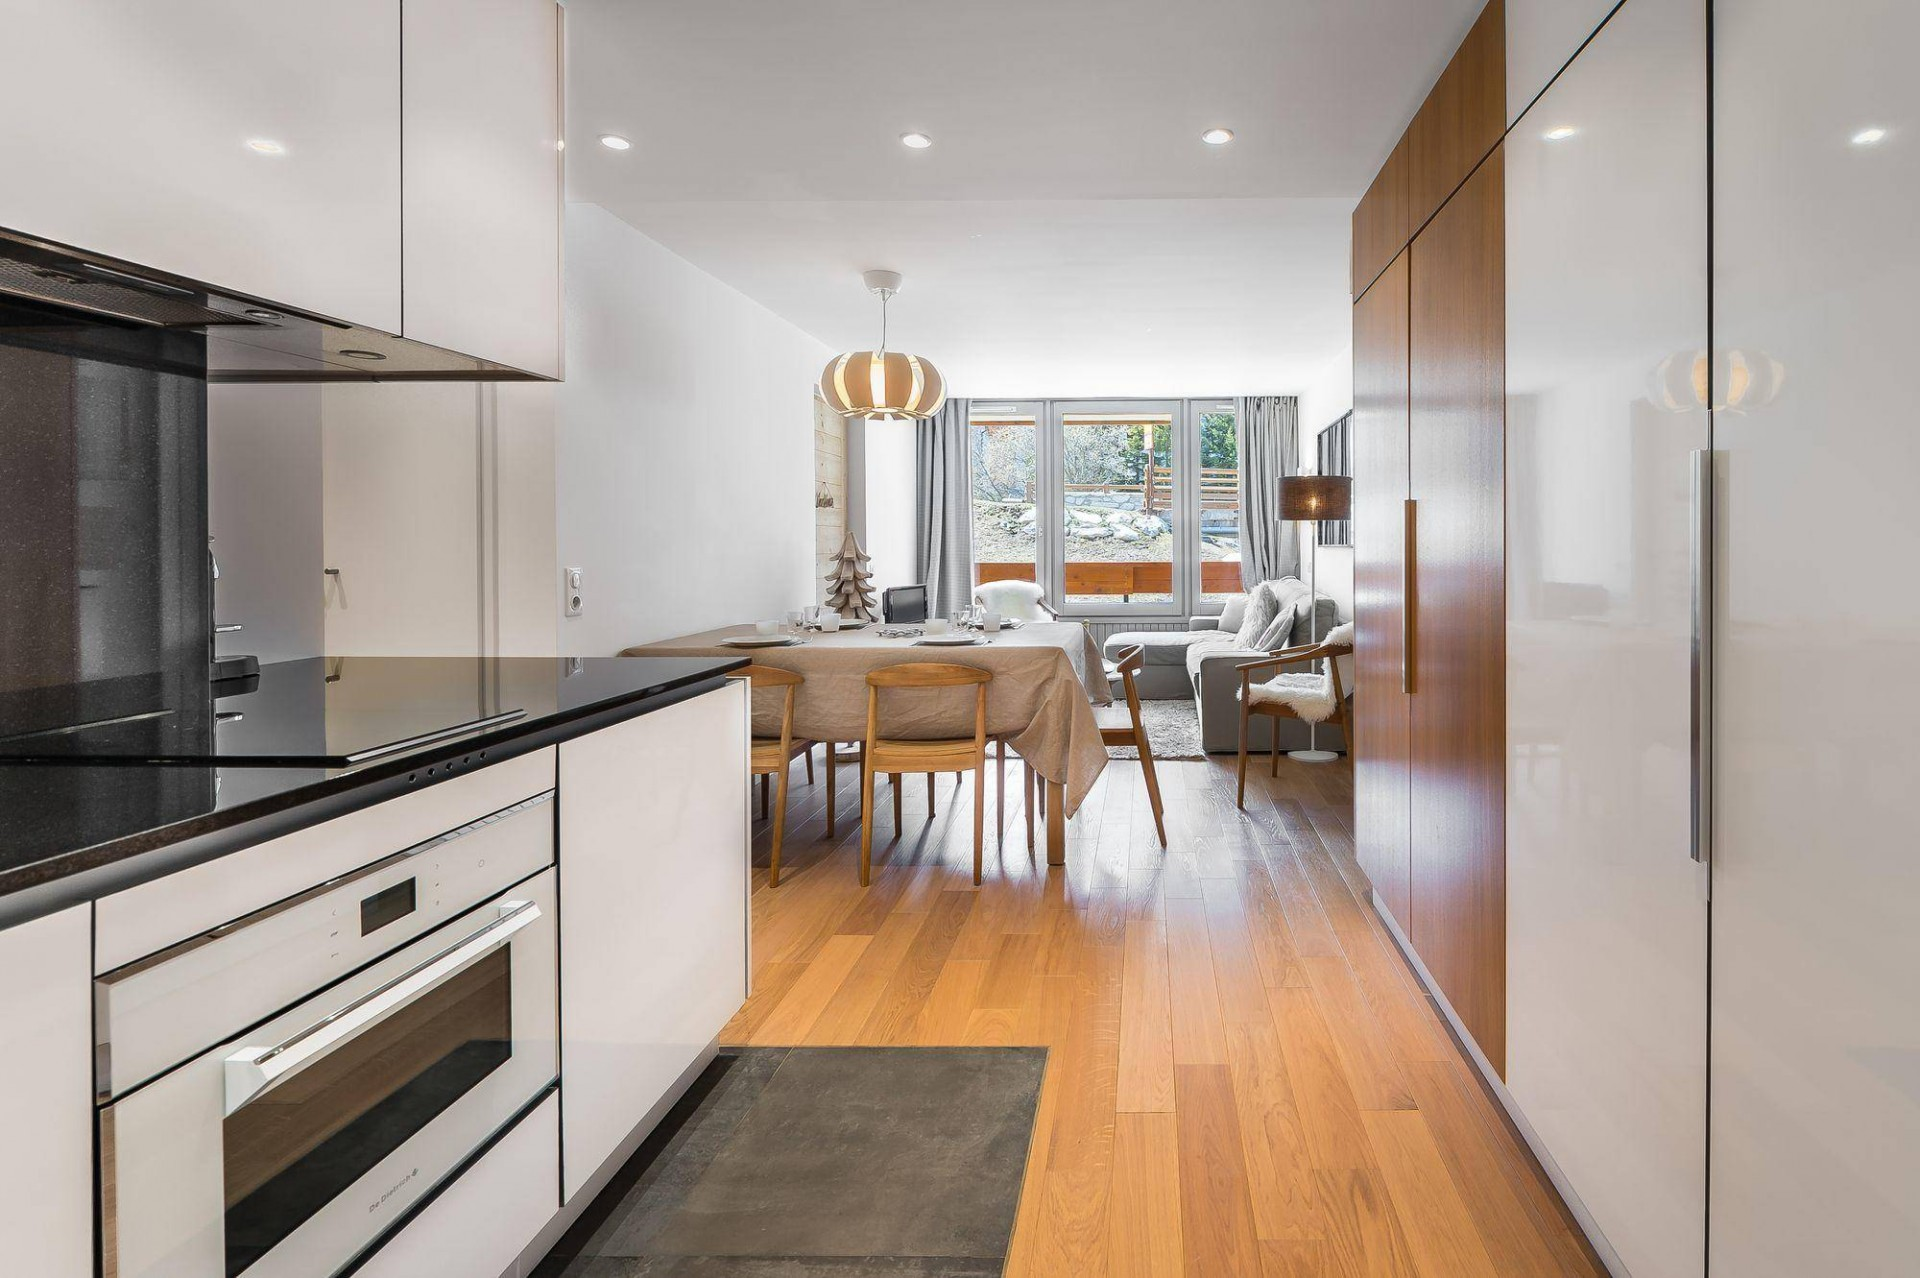 Val d'Isère Luxury Rental Appartment Eclaite Kitchen